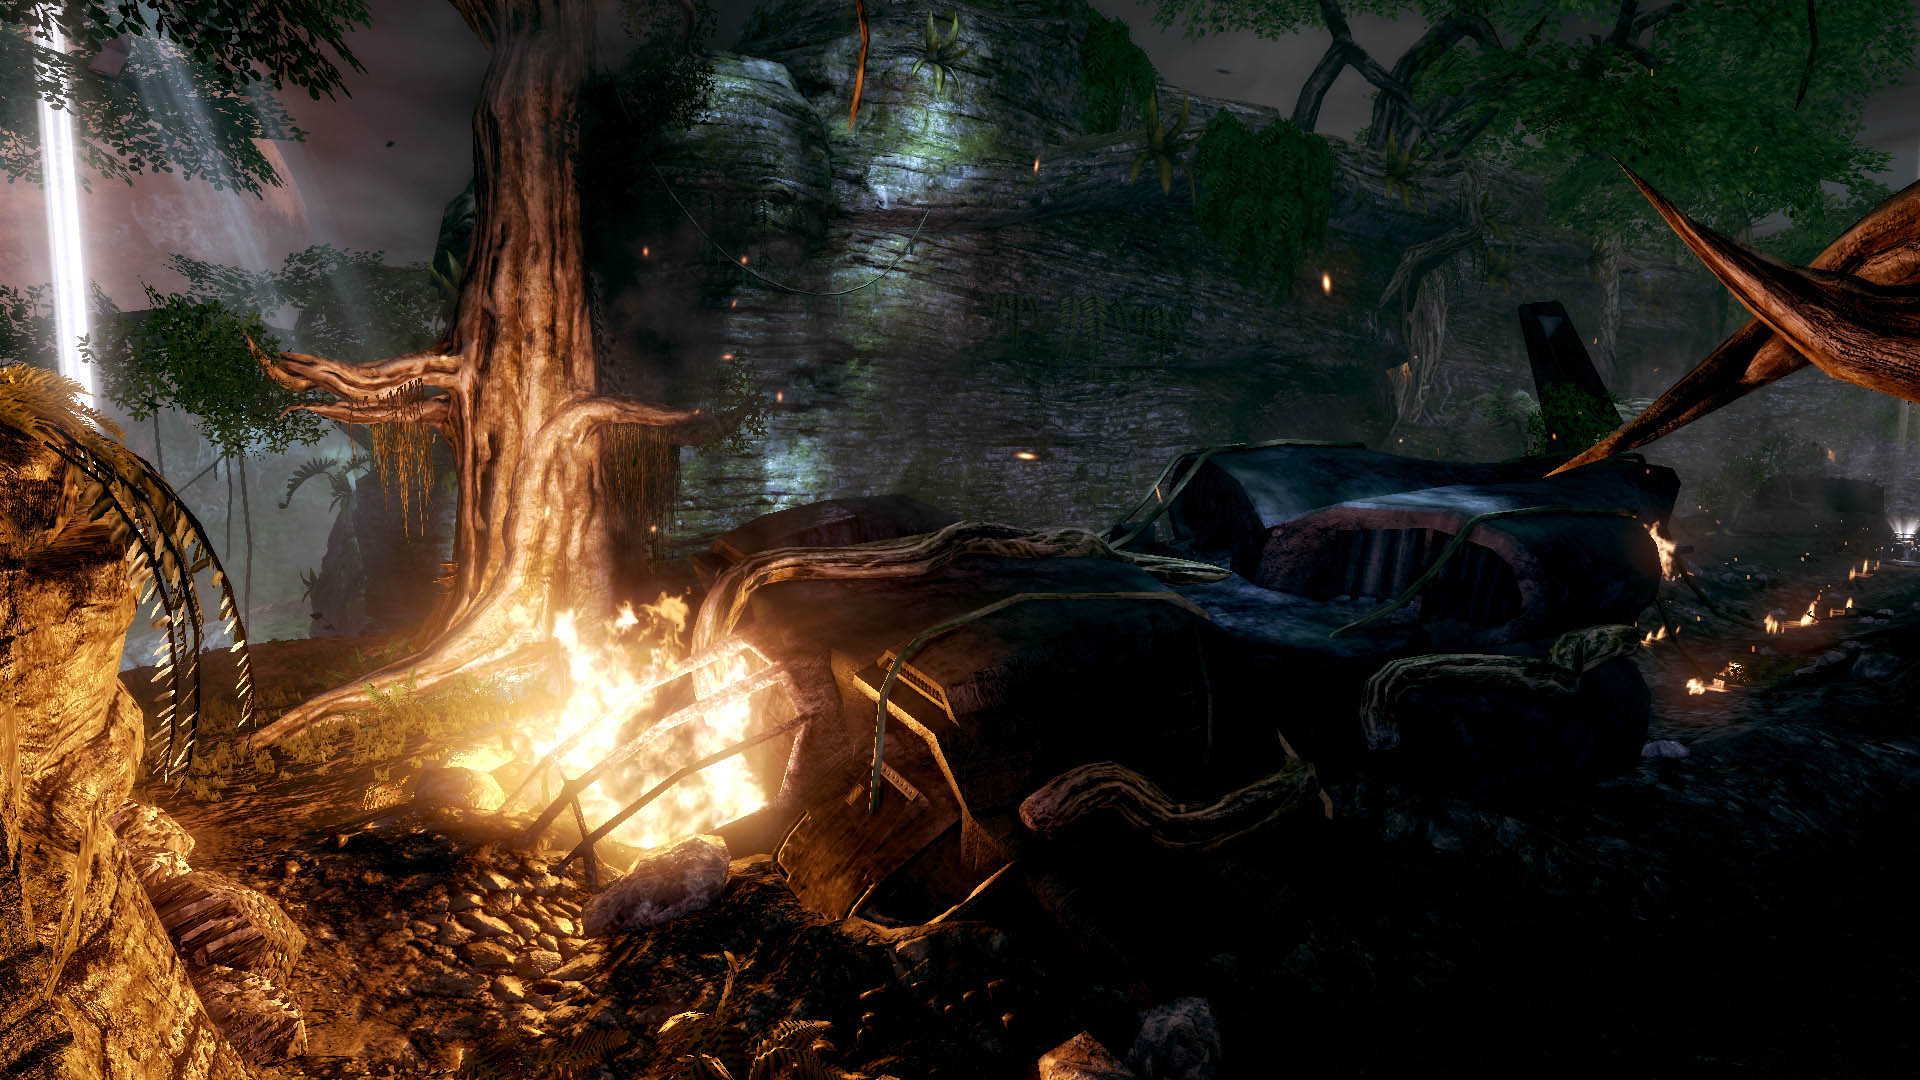 Aliens vs. Predator - Bughunt DLC Screenshots